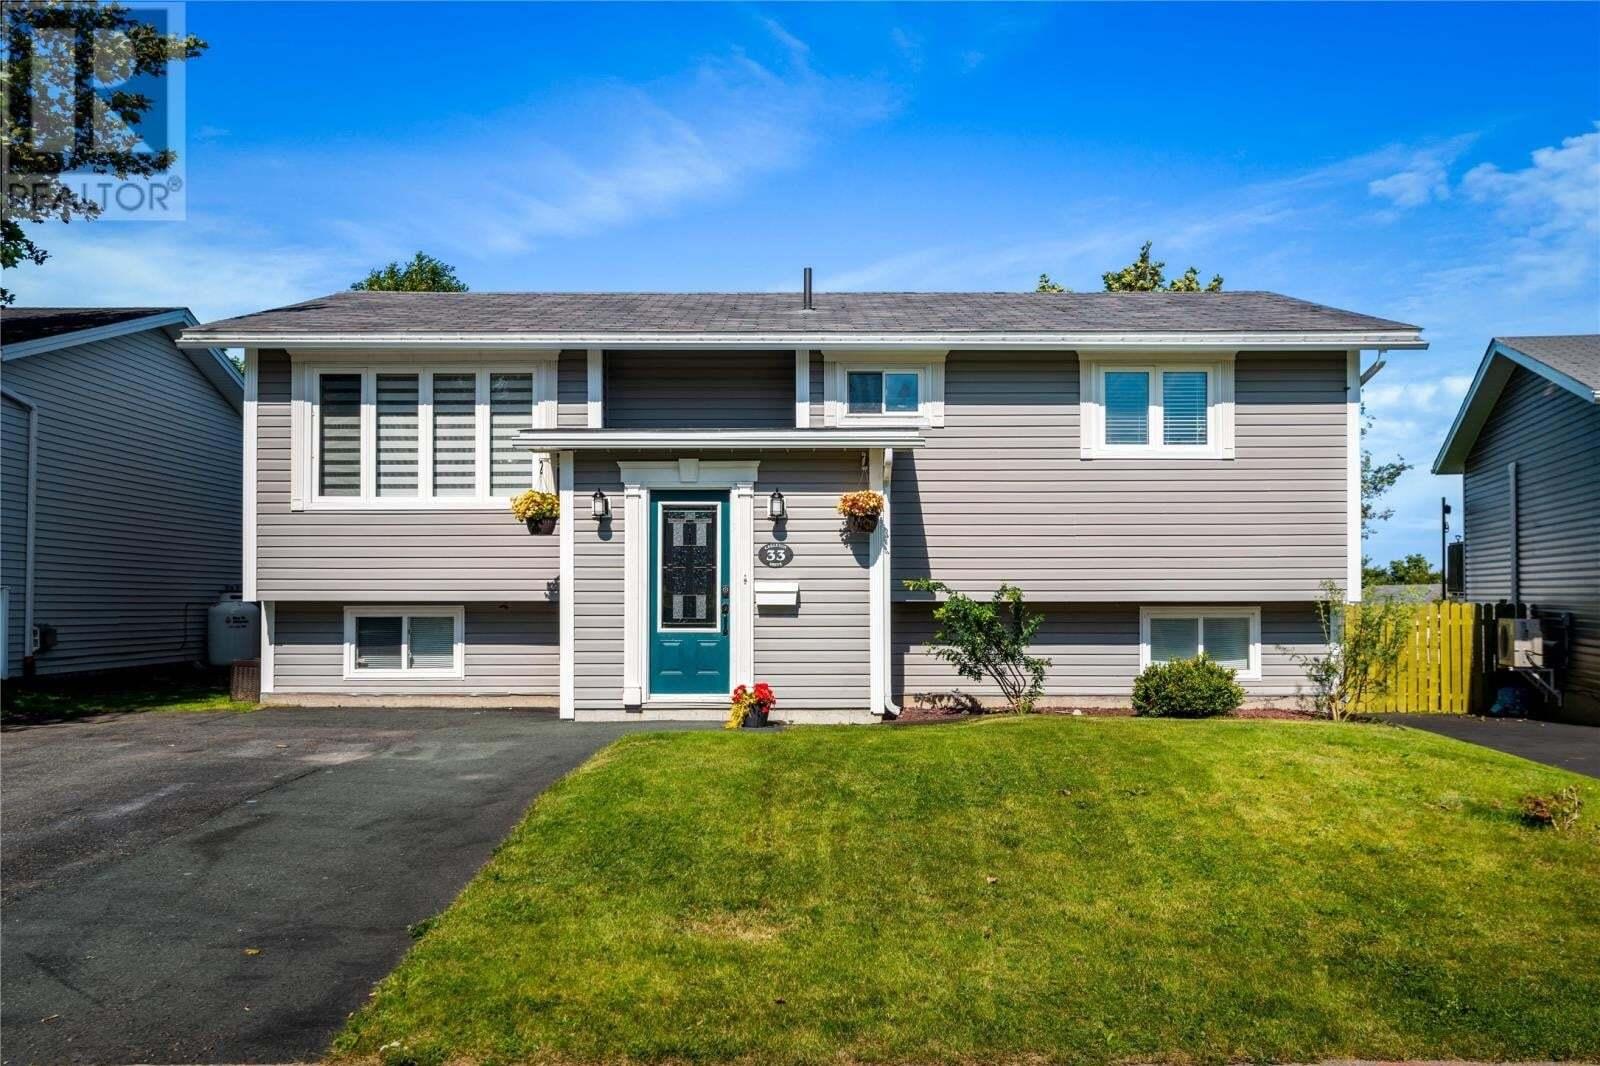 House for sale at 33 Carleton Dr Mount Pearl Newfoundland - MLS: 1221052